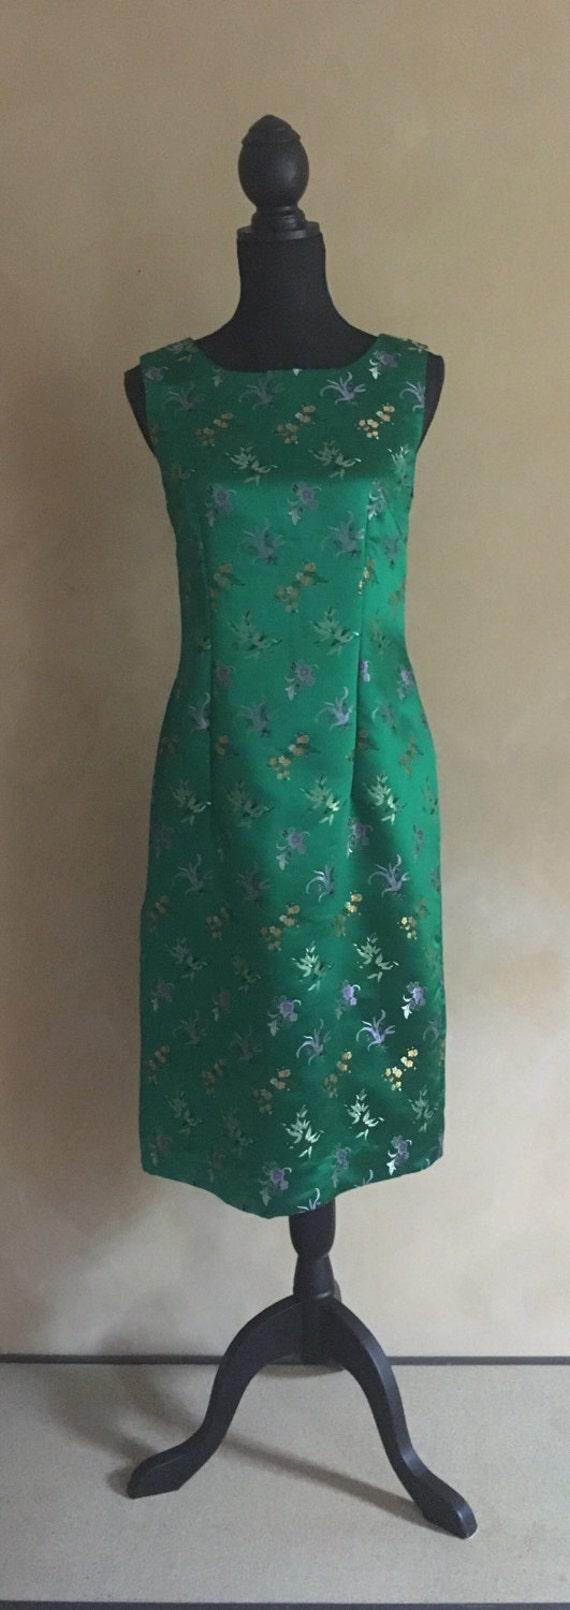 Satin Dress Vintage 1960's Green Brocade Shift Dress